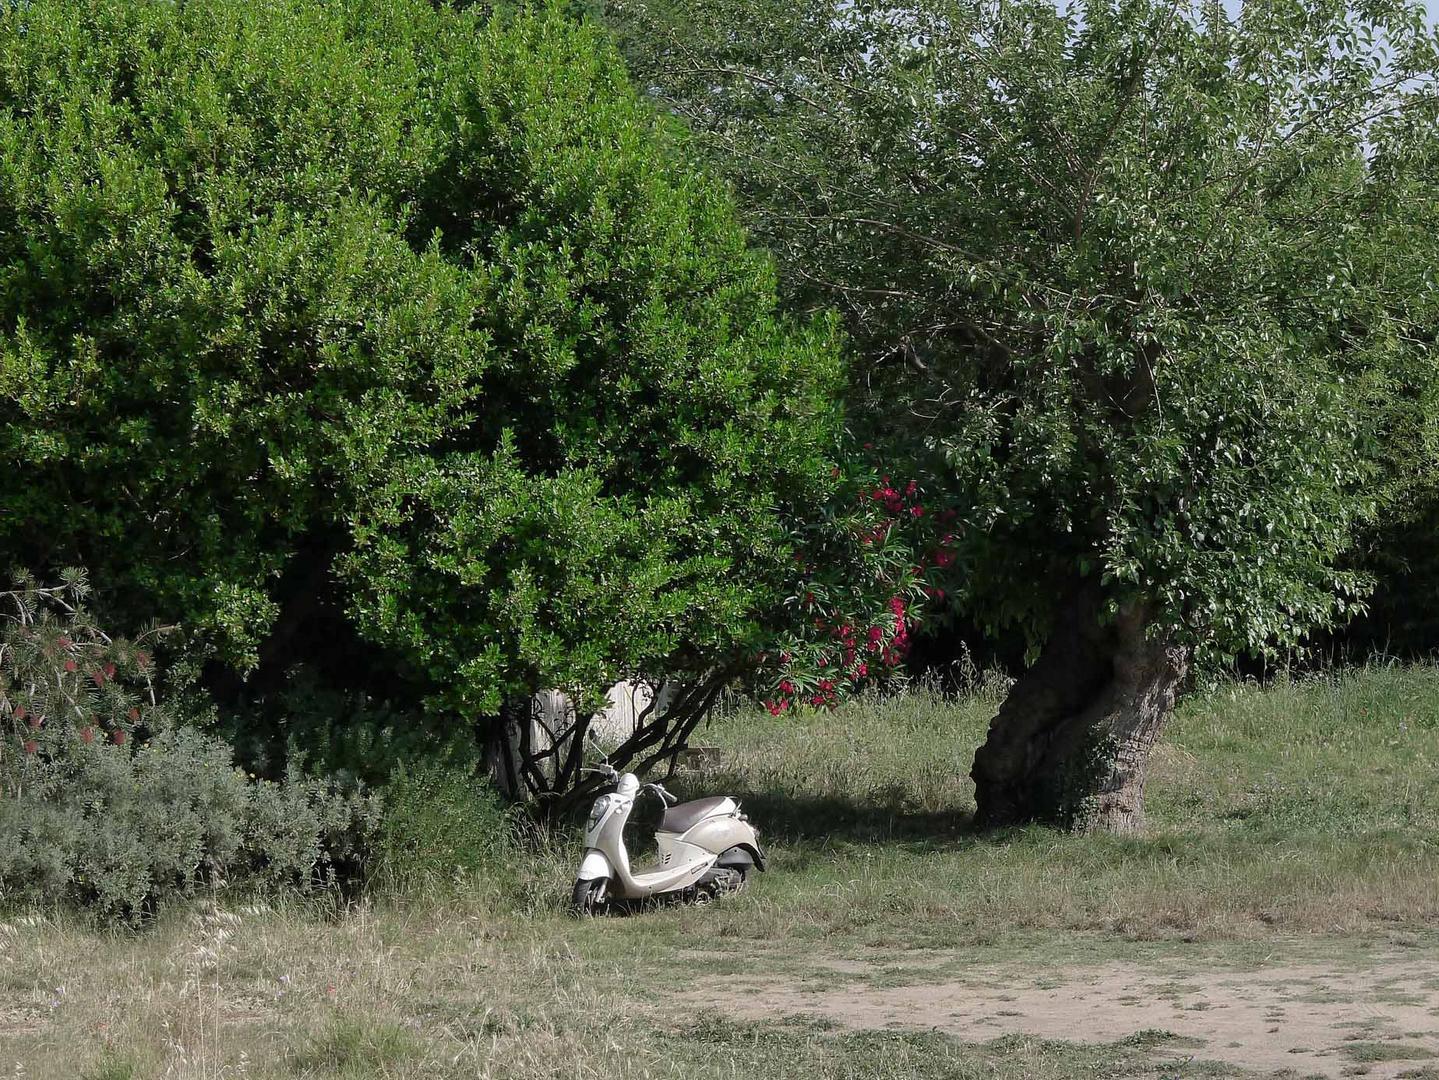 Picknick in der provence am Waldesrand